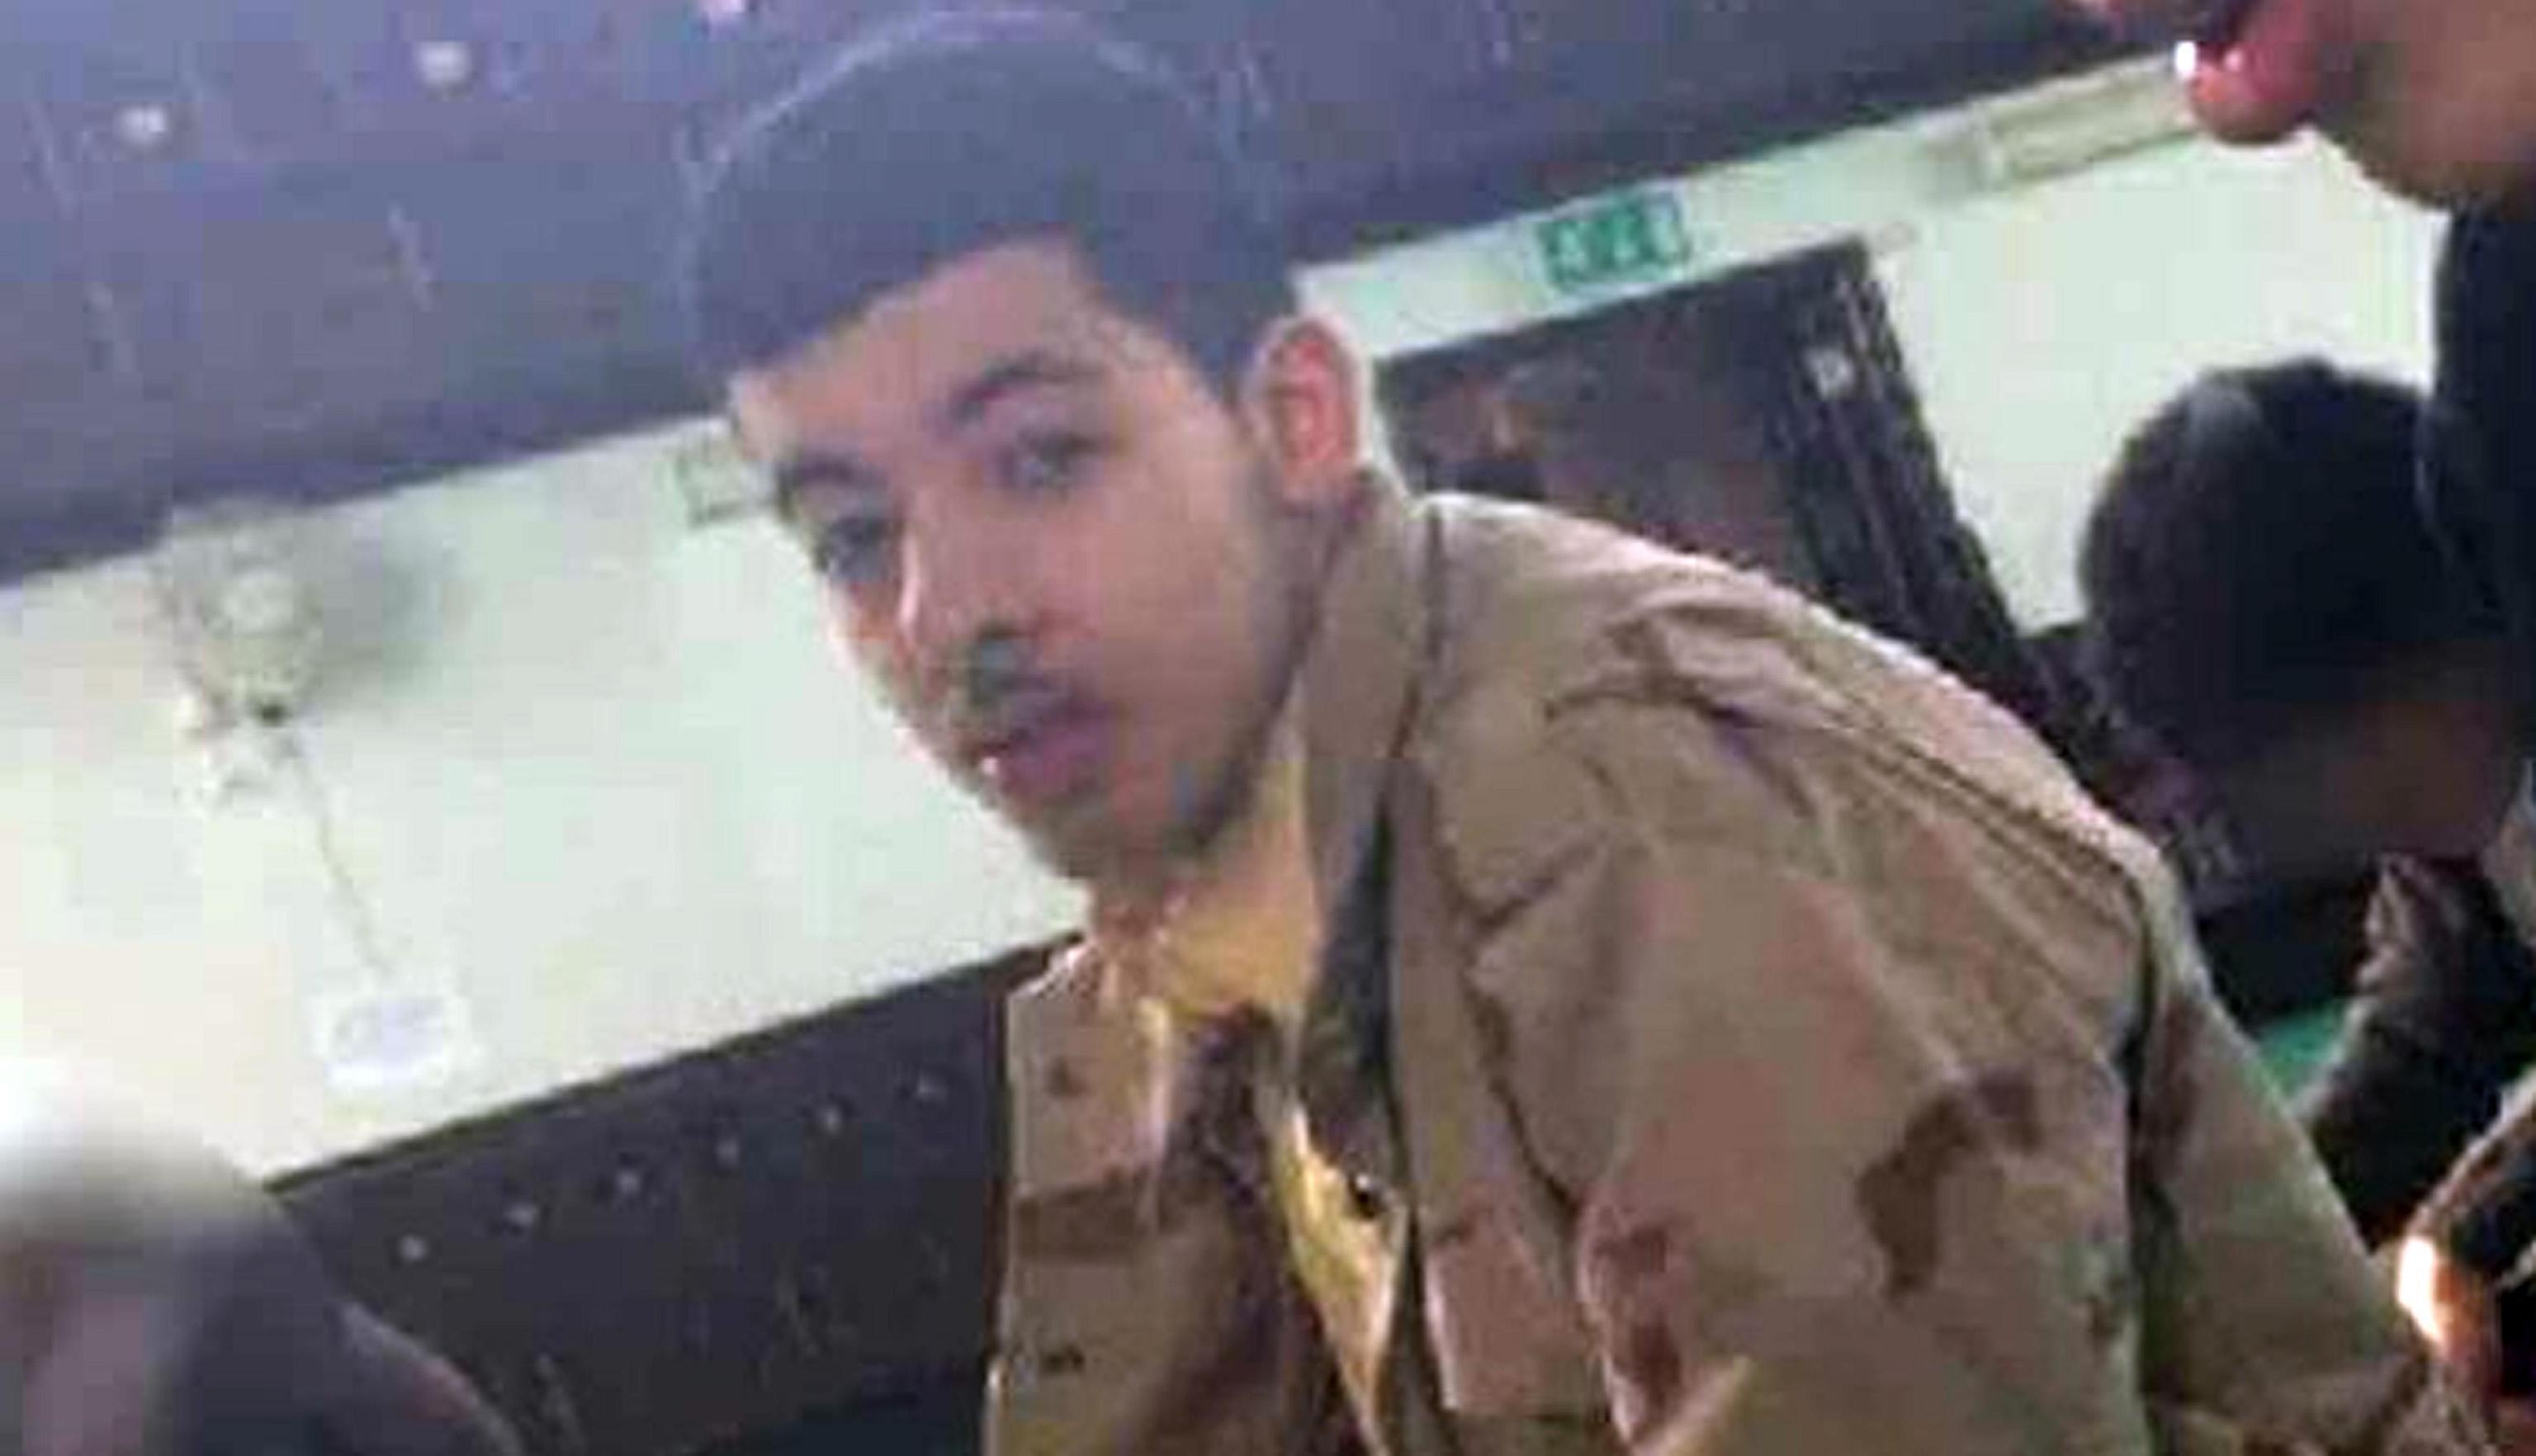 Salman Abedihad traveled to Libya, where he had family, and